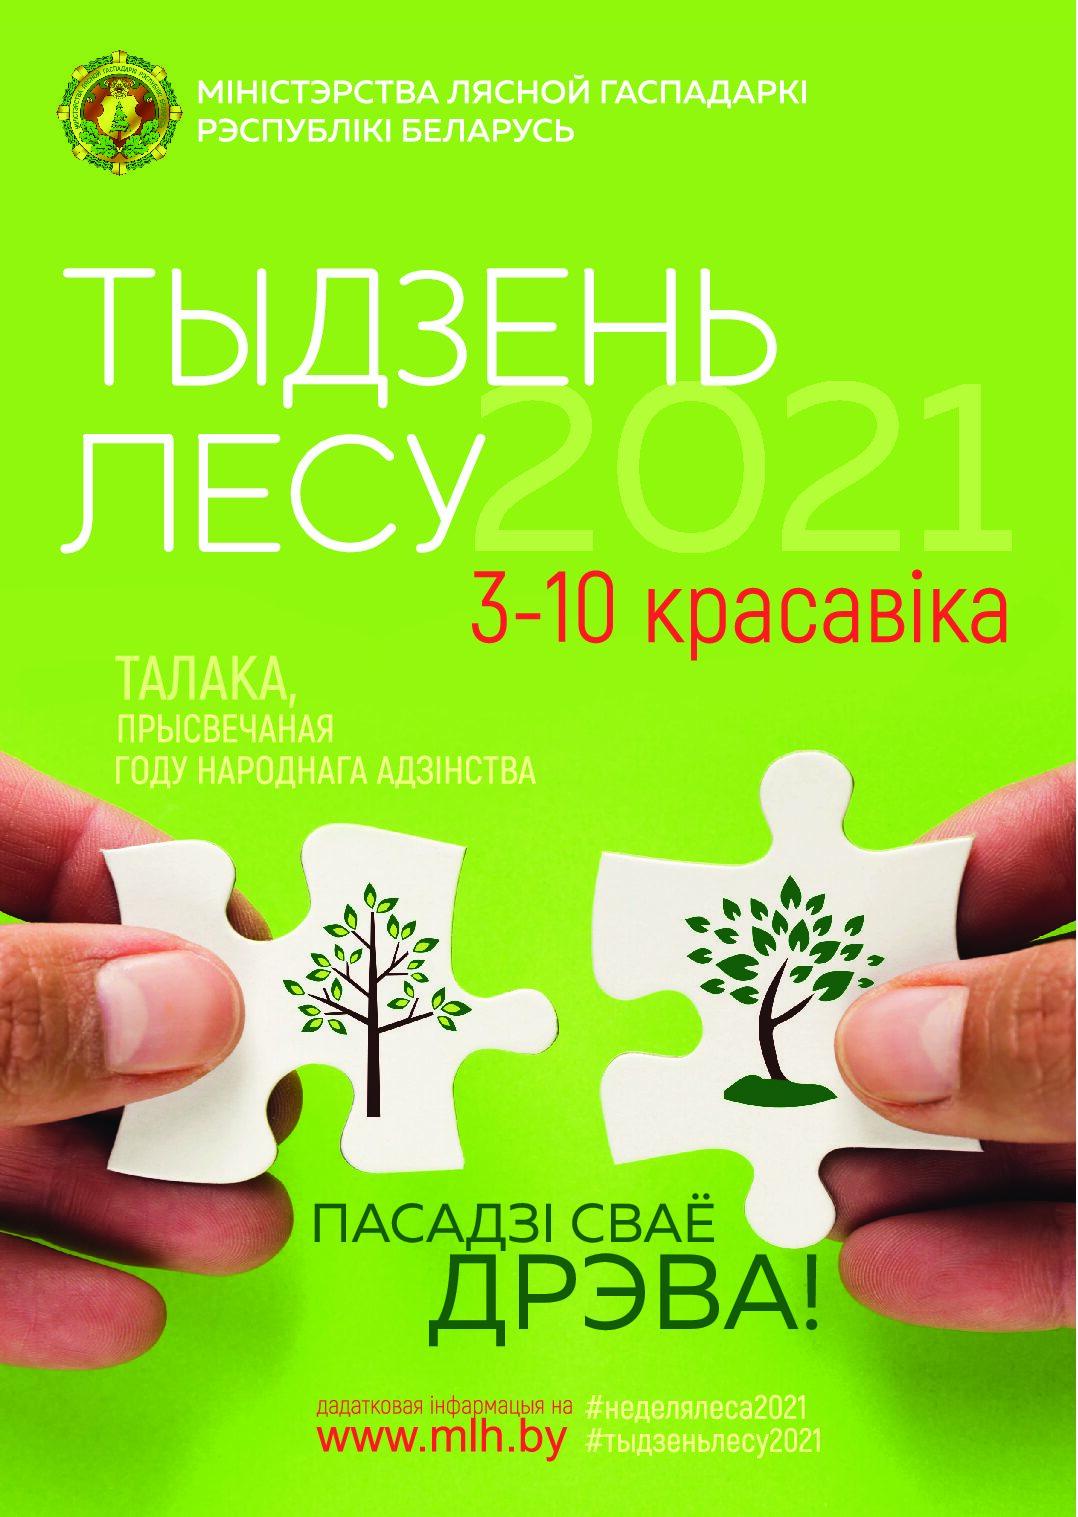 «Неделя леса» пройдет в Беларуси с 3 по 10 апреля